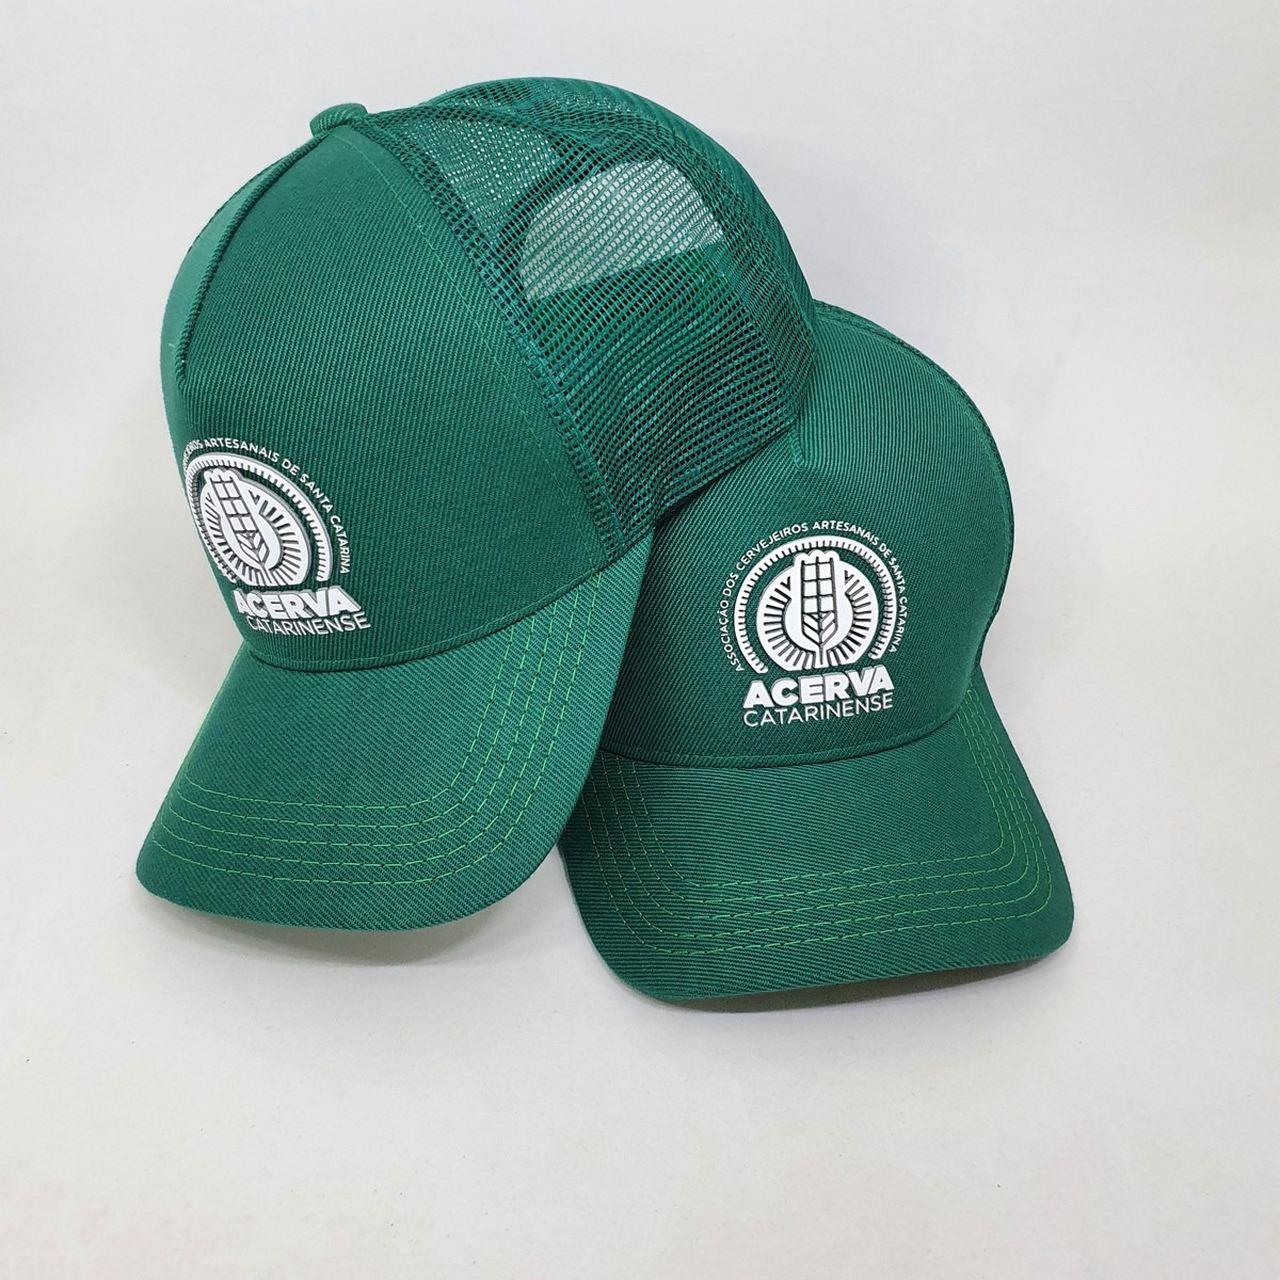 Boné Trucker Verde/Estampado Acerva Catarinense